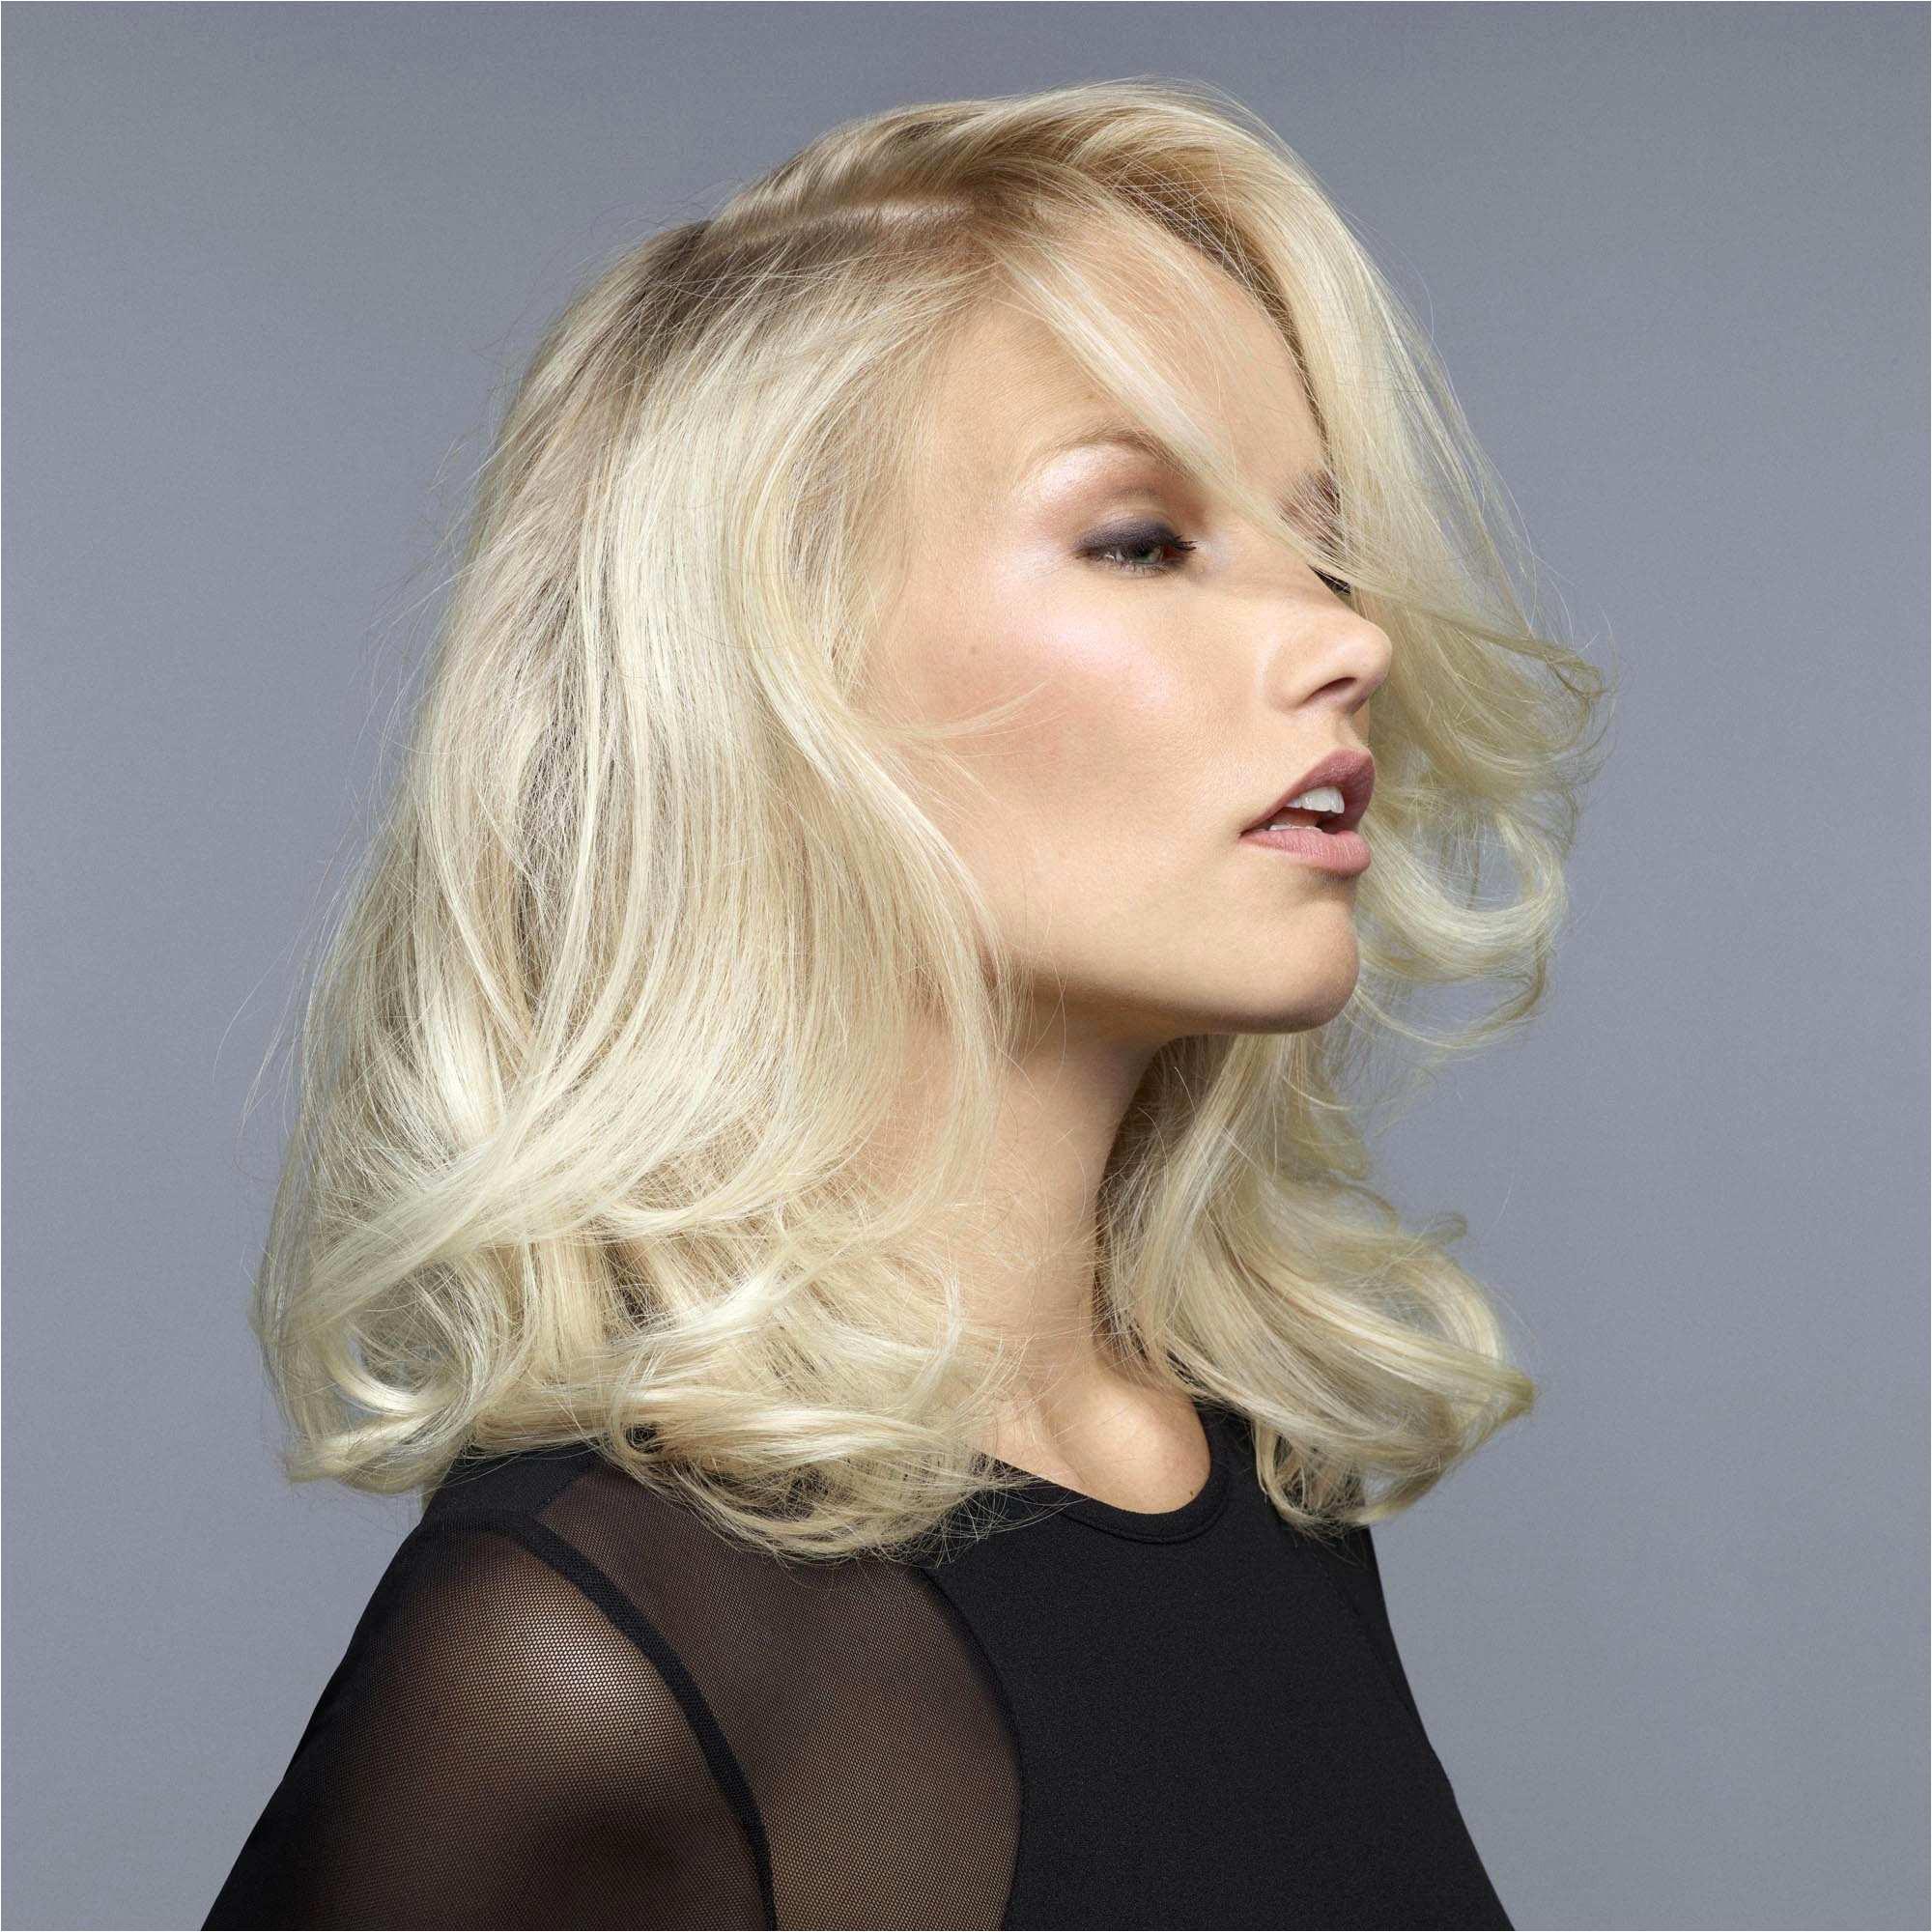 Hair Stylist Shop Awesome Curly Hair Cuts Men Hair Salon Nouveau Best Hairstyle Men 0d